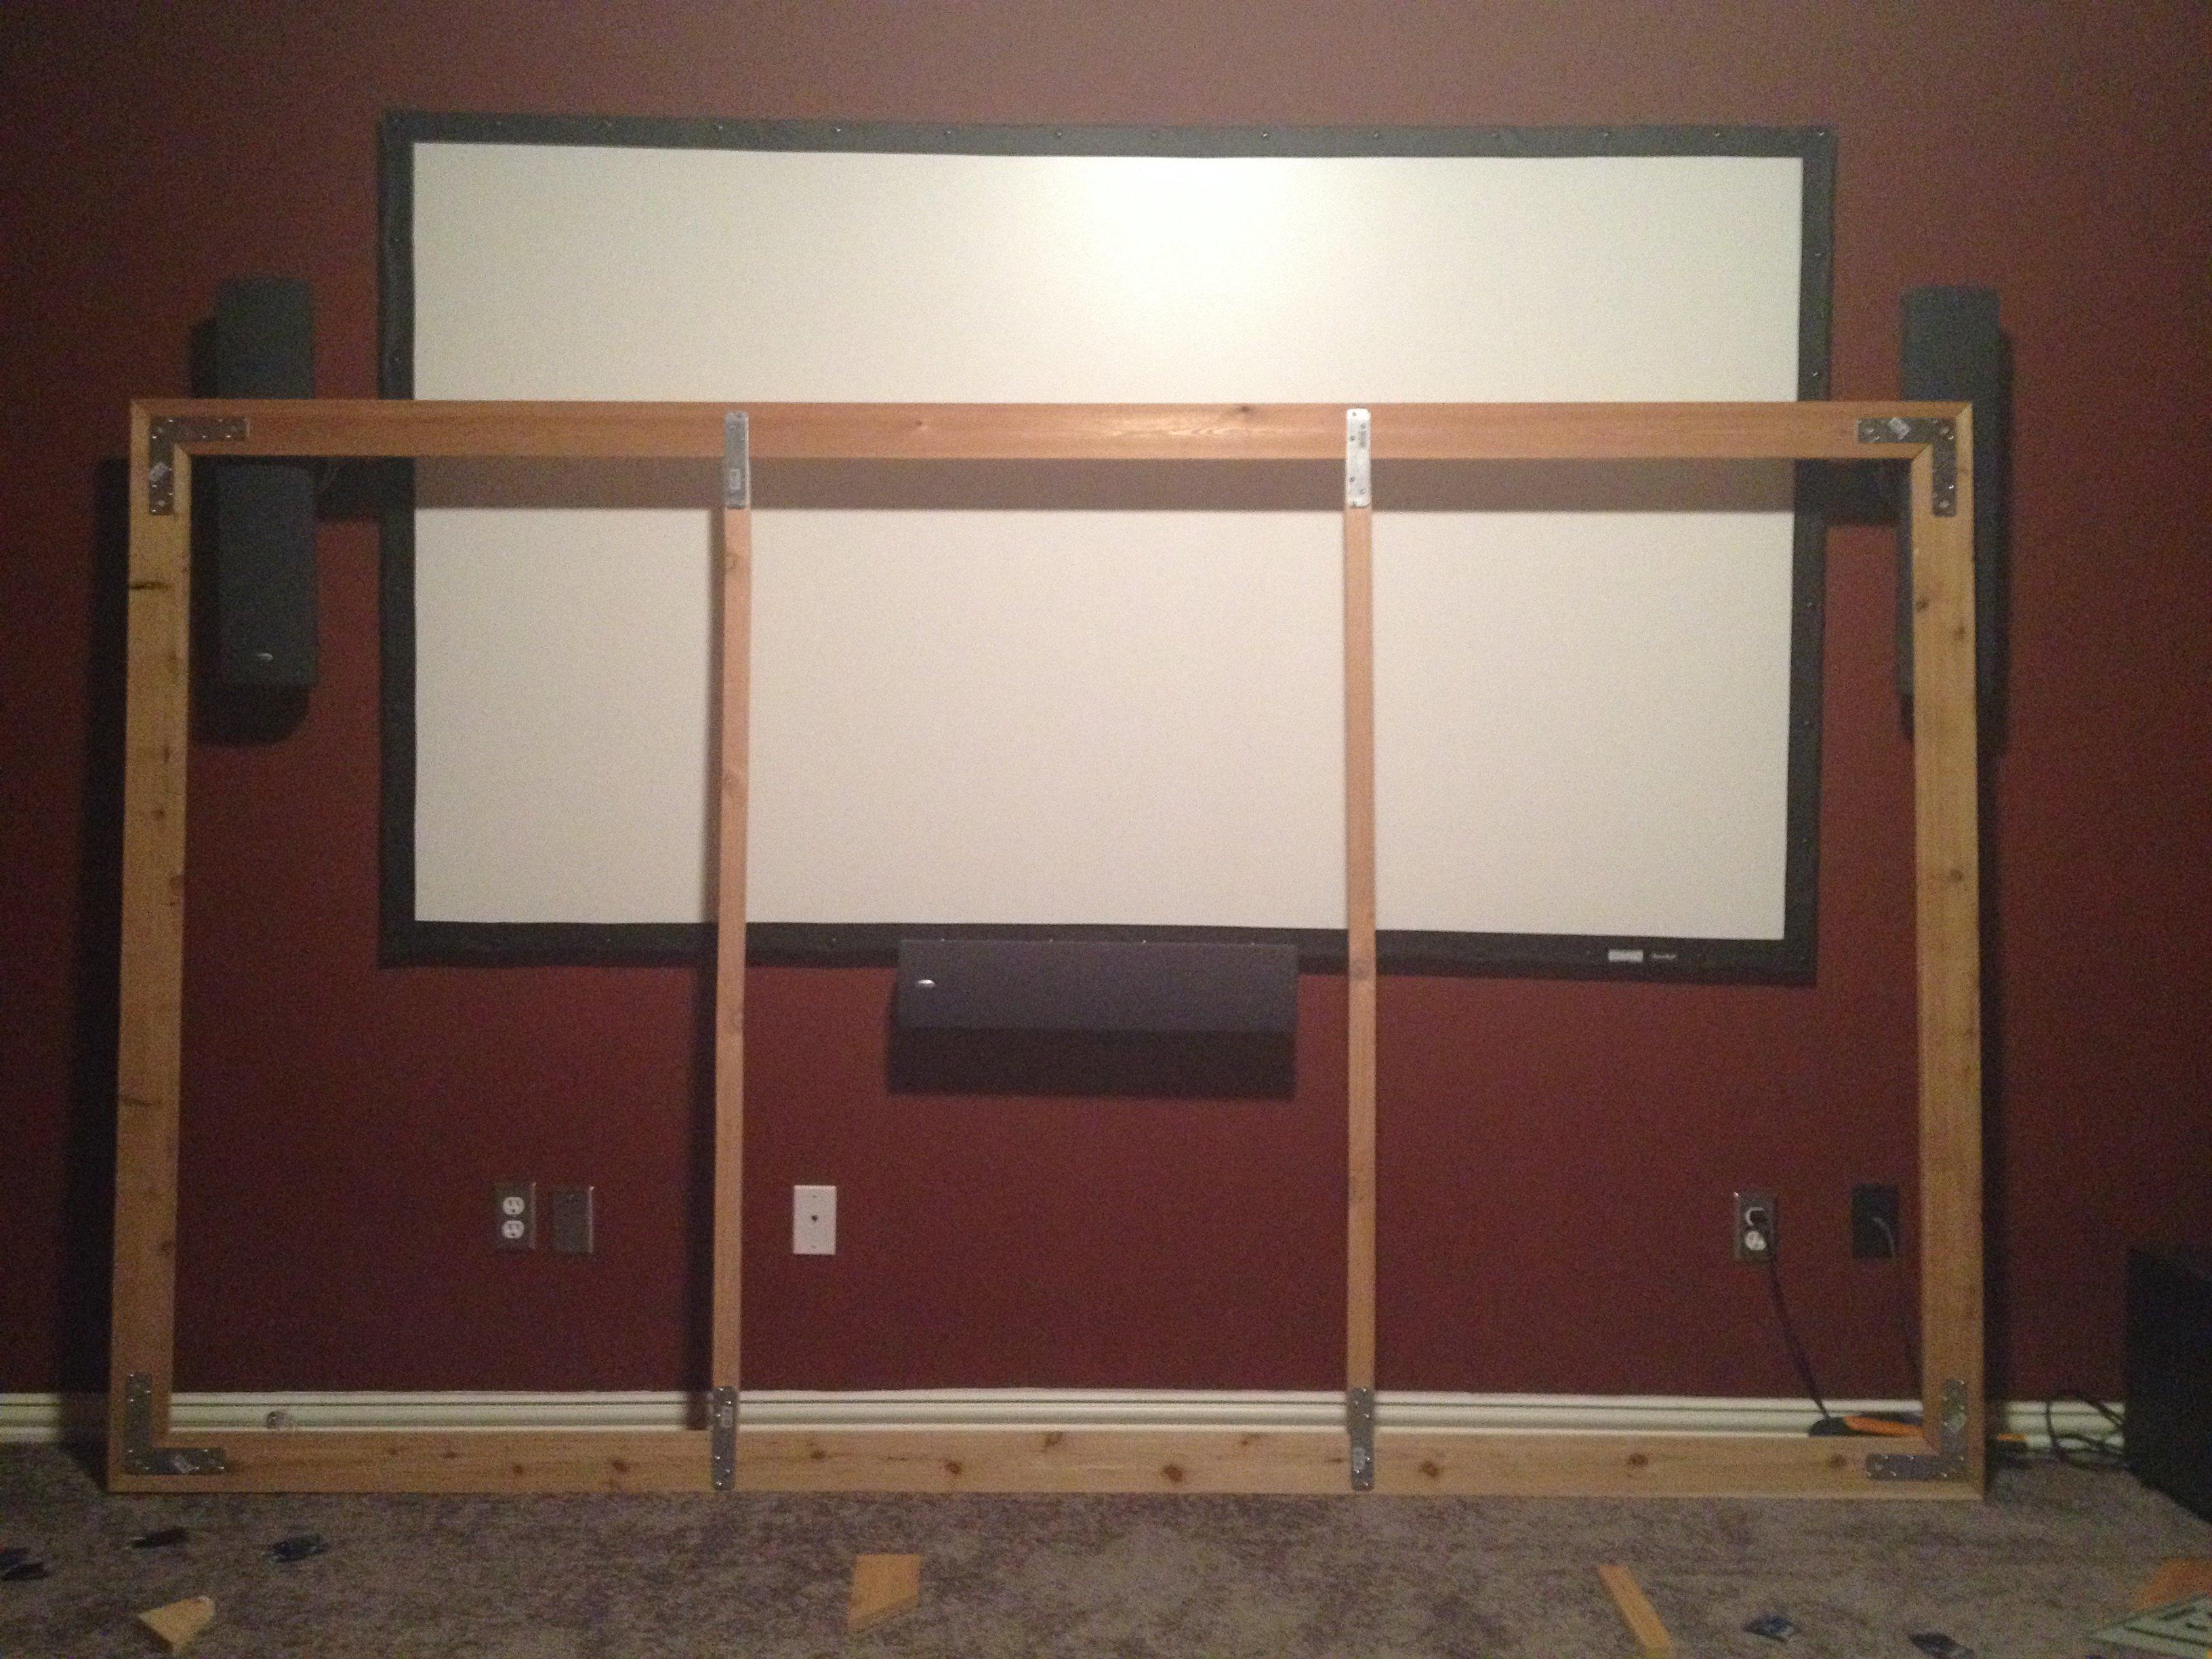 Decorative Custom DIY Projector Screen Frame - AVS Forum | Home ...